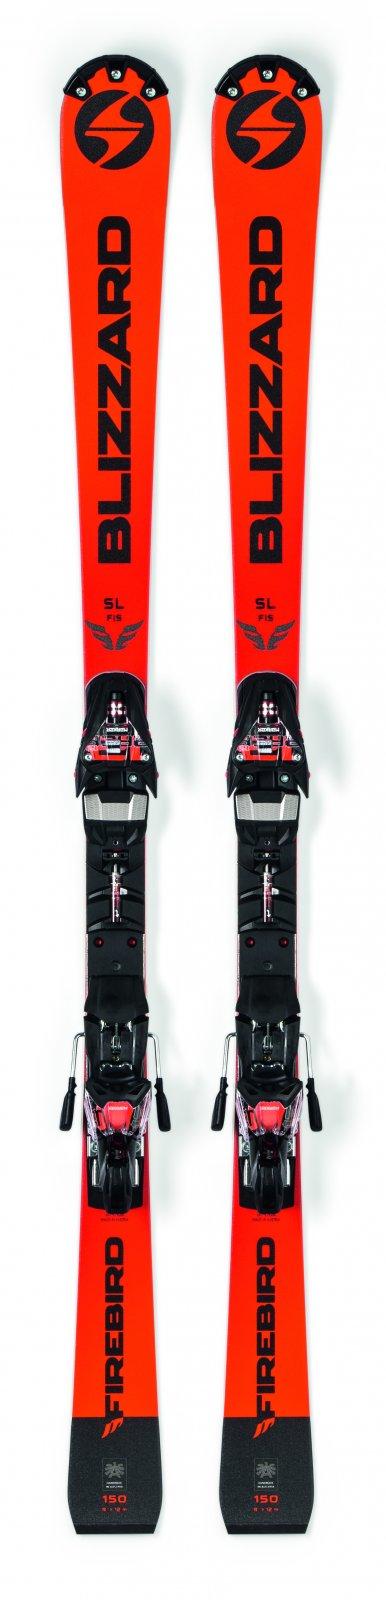 2020 Blizzard Firebird SL FIS